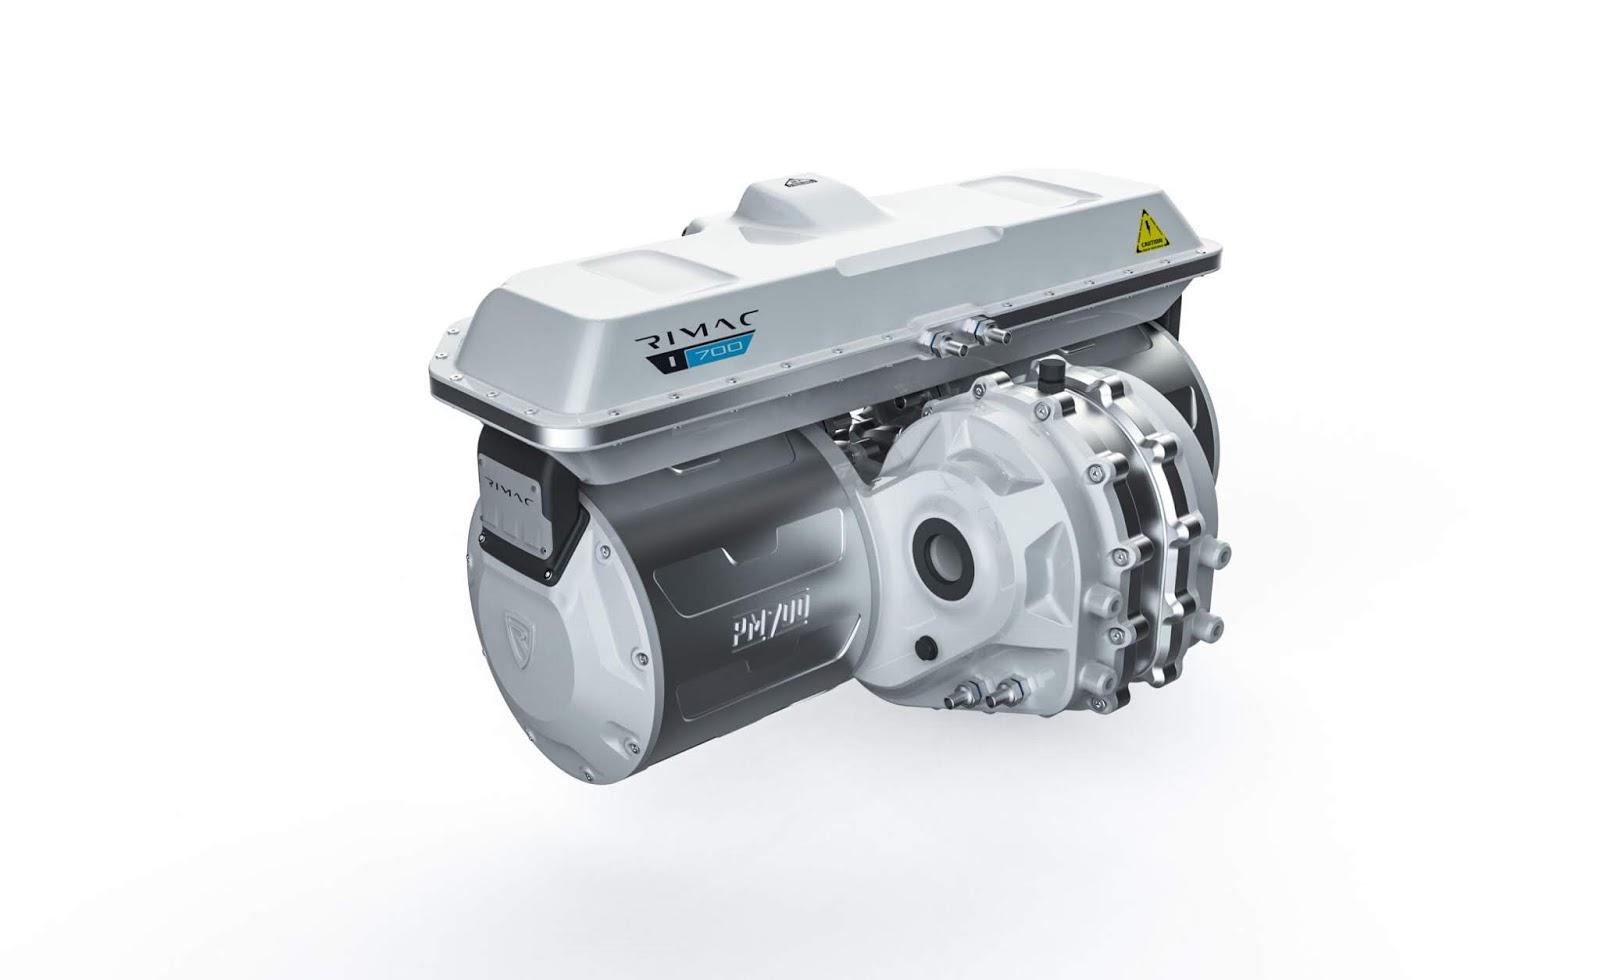 c two motors Rimac C Two. Η νέα φυλή στα hypercars, έρχεται με 1900 ίππους. C Two, Electric cars, hypercar, Rimac, zblog